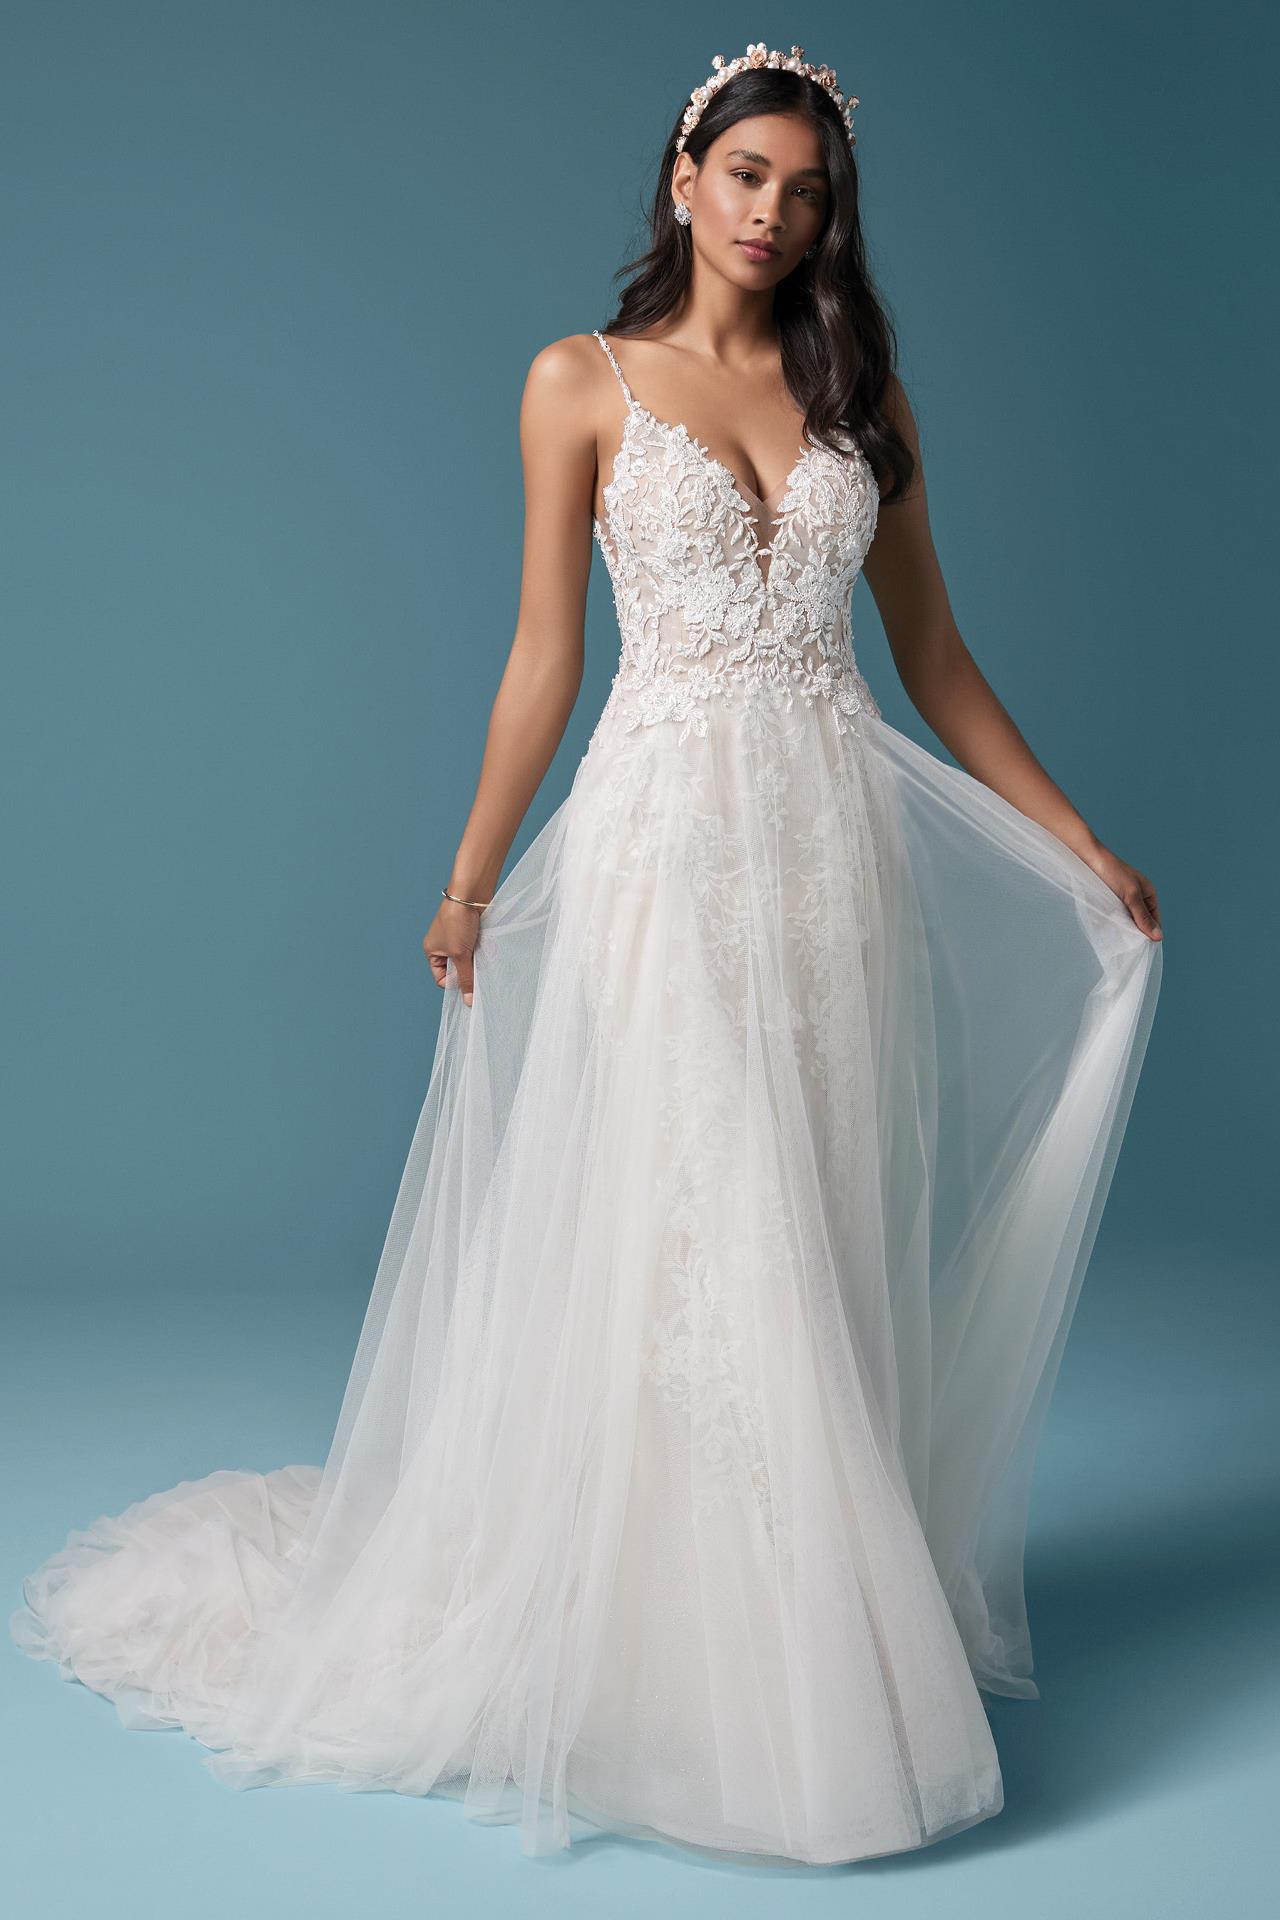 A-Line Wedding Dresses   Alfred angelo wedding dress